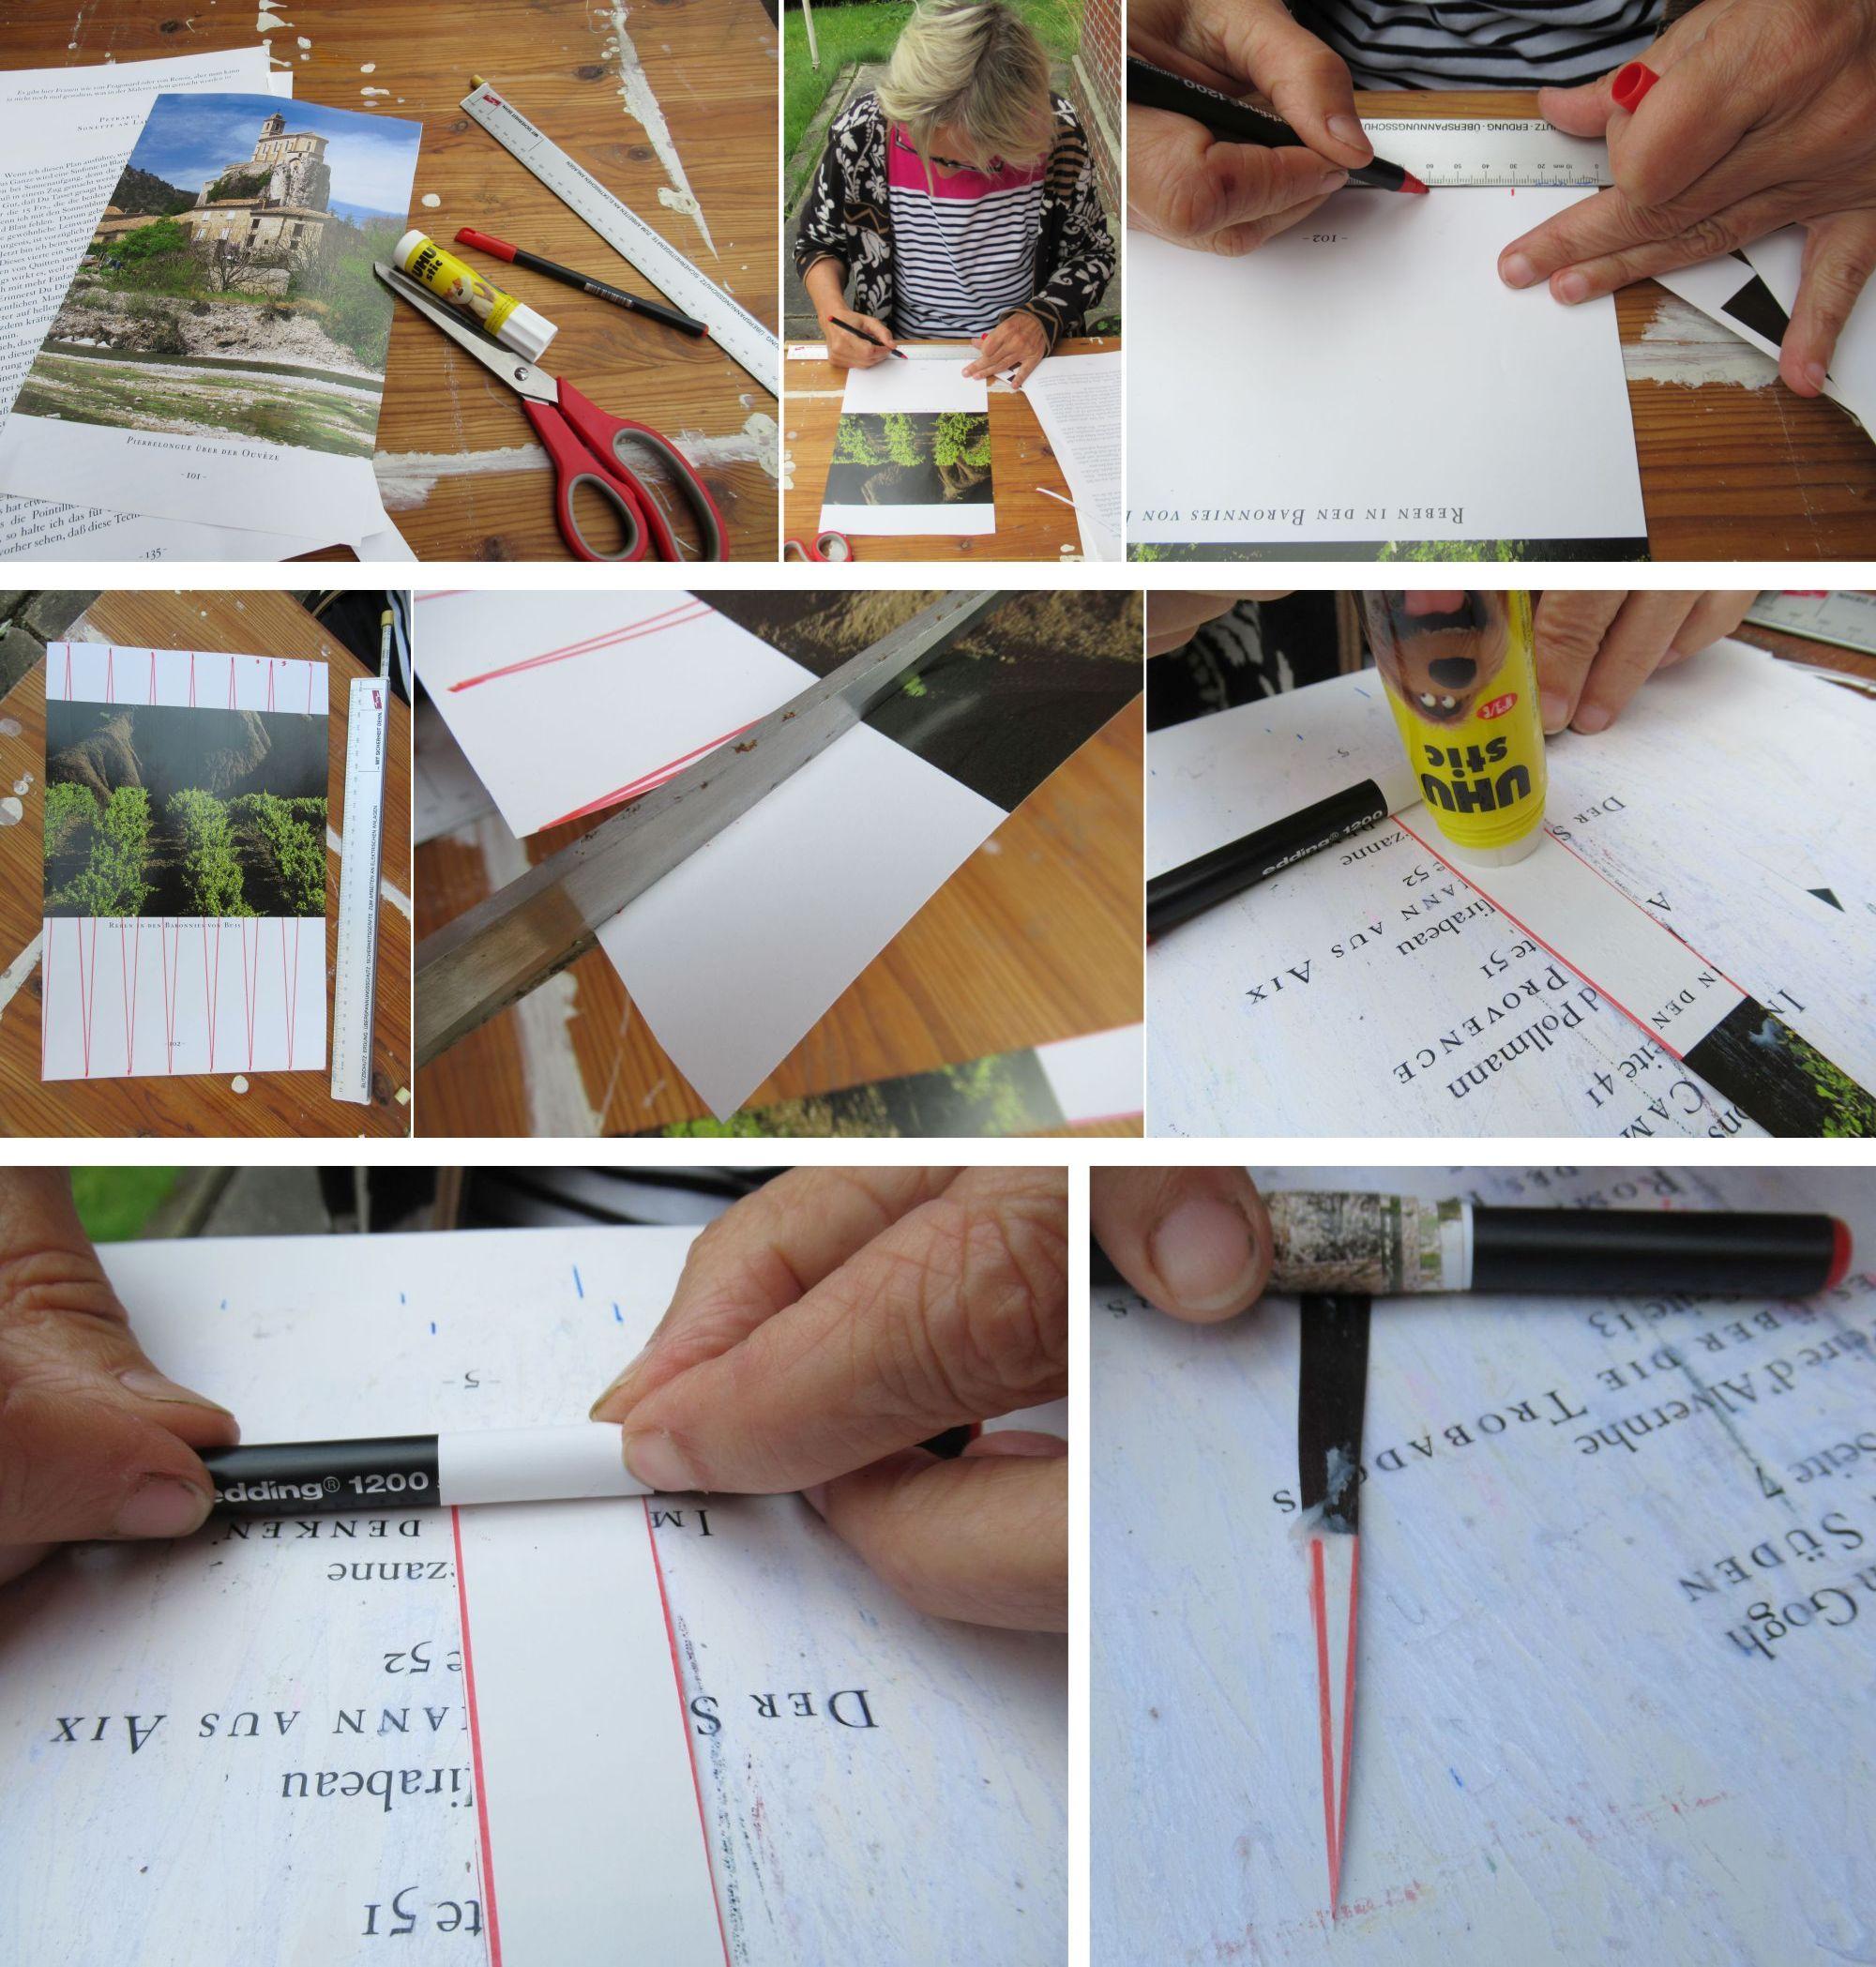 Anleitung Papierperlen aus Altpapier herstellen